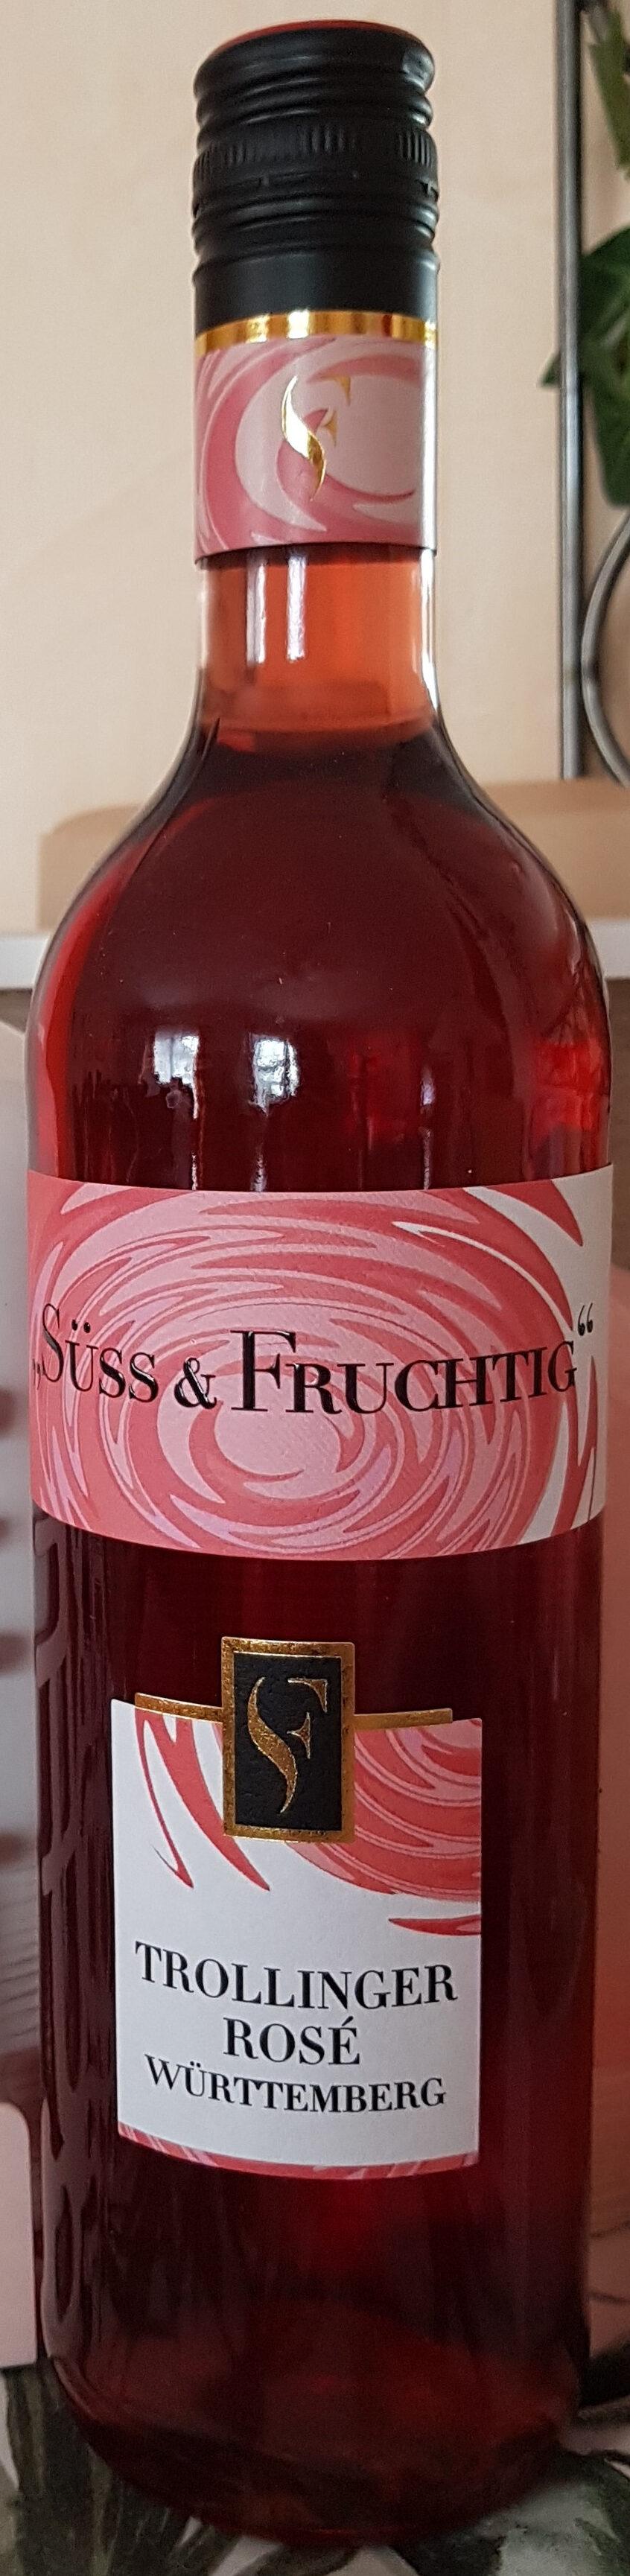 Trollinger Rosé Württemberg süss & fruchtig - Product - de